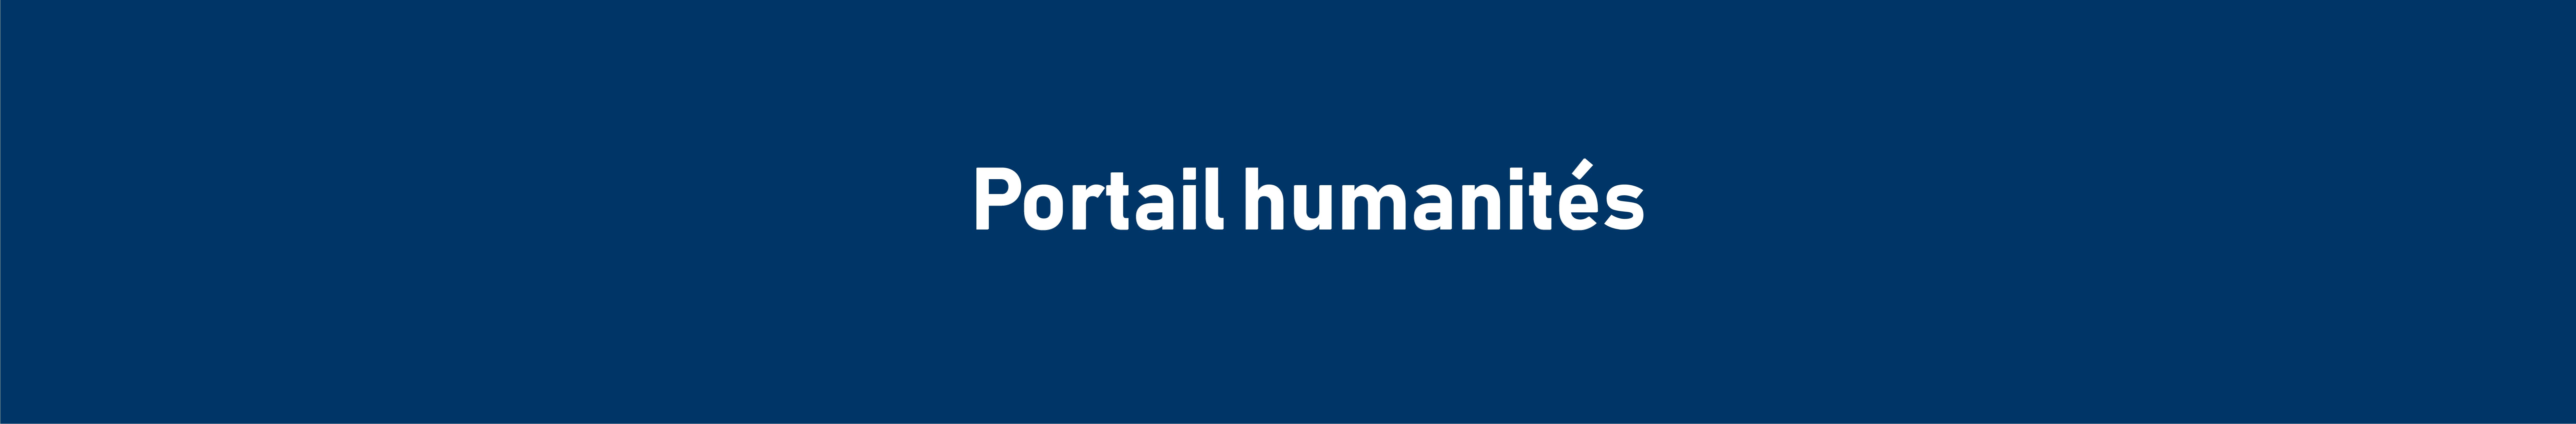 Portail humanités